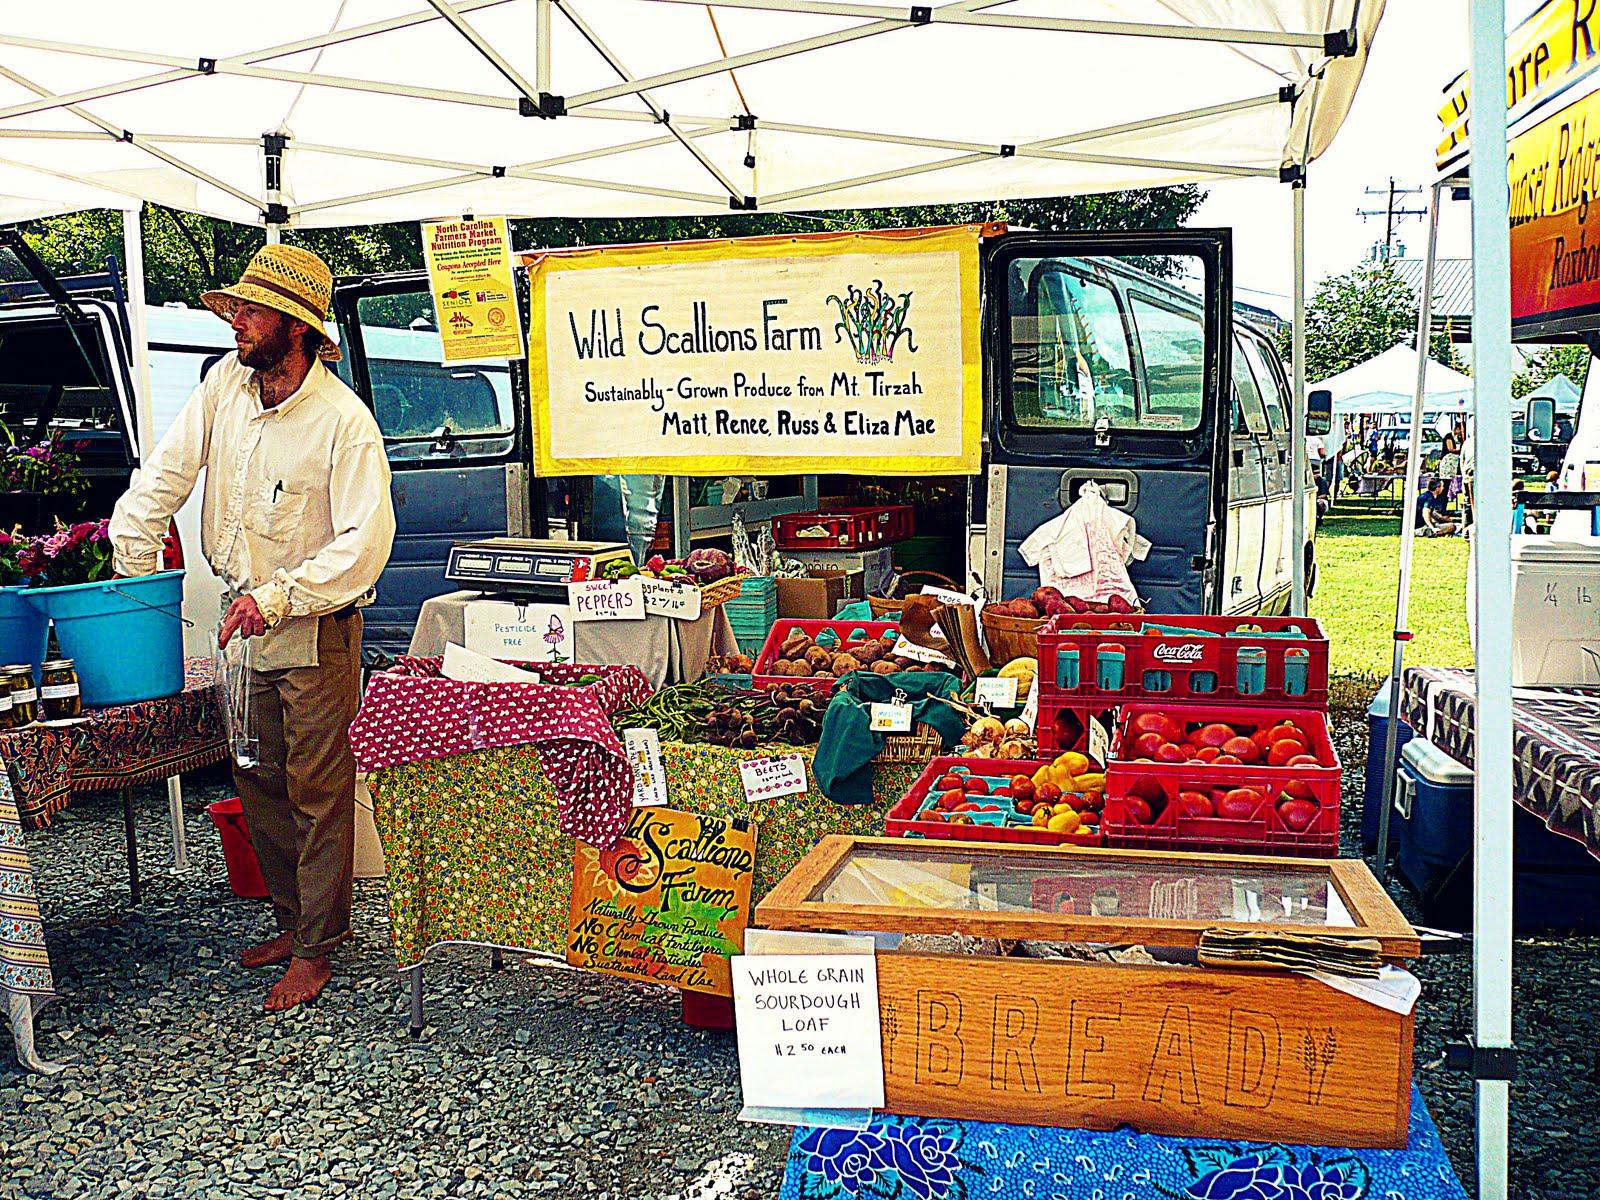 Inspiration treasures farmers market tomato tasting